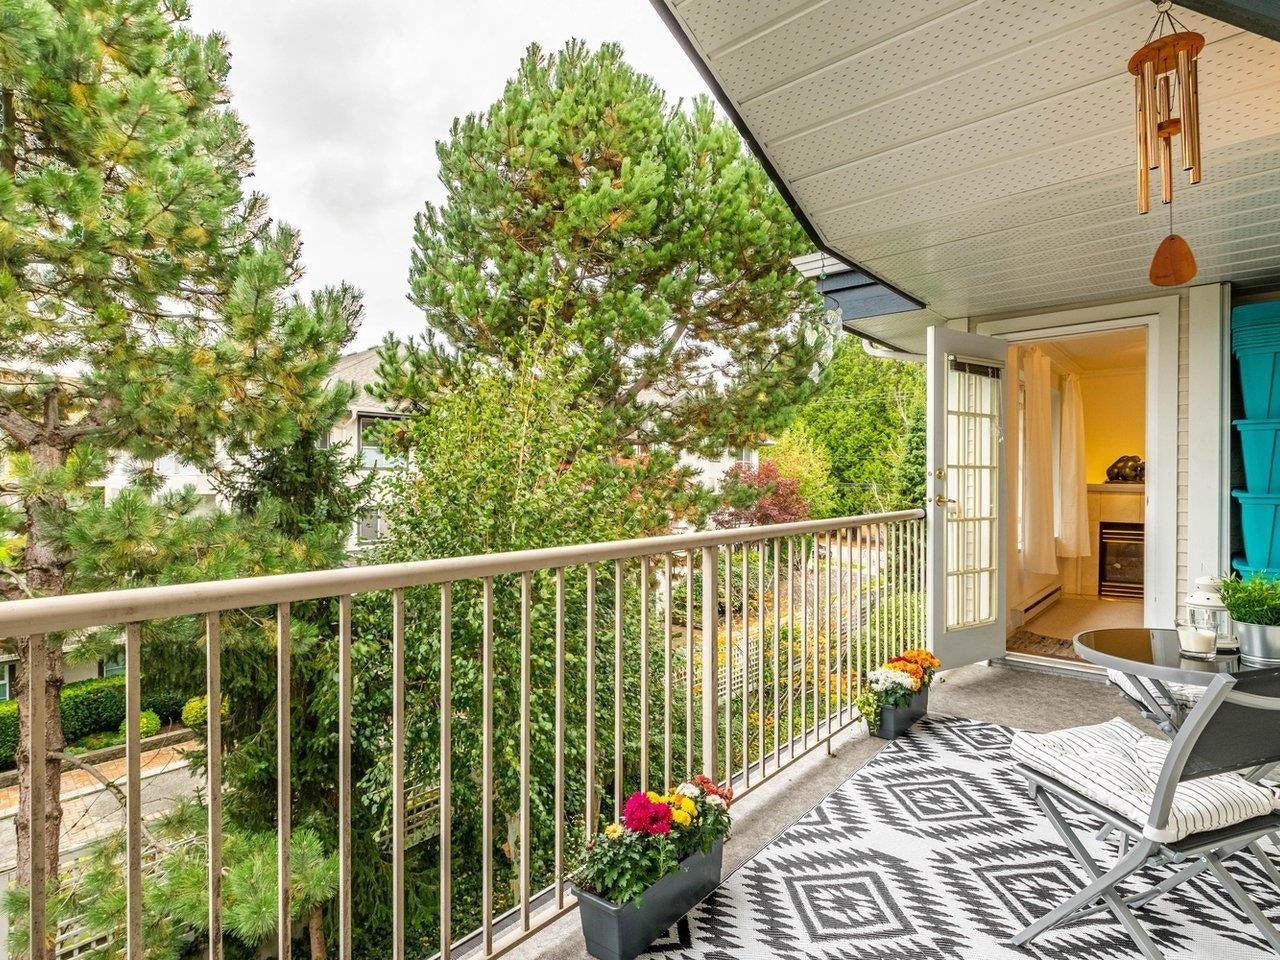 306 15298 20 AVENUE - King George Corridor Apartment/Condo for sale, 2 Bedrooms (R2625551) - #18